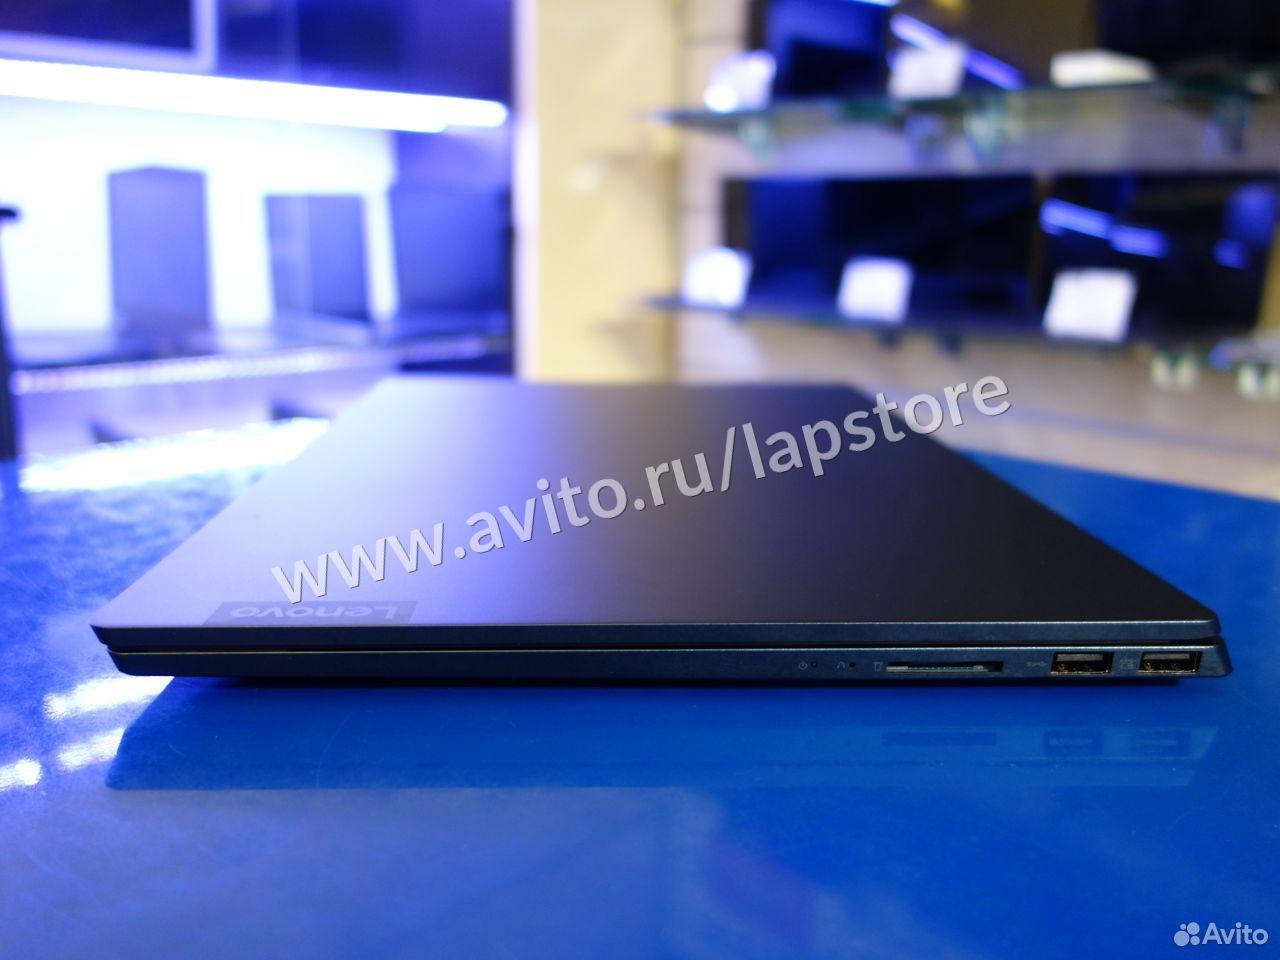 Ноутбук Lenovo S540 i5-10210/8G/512G SSD/MX250 2GB  84012422018 купить 6